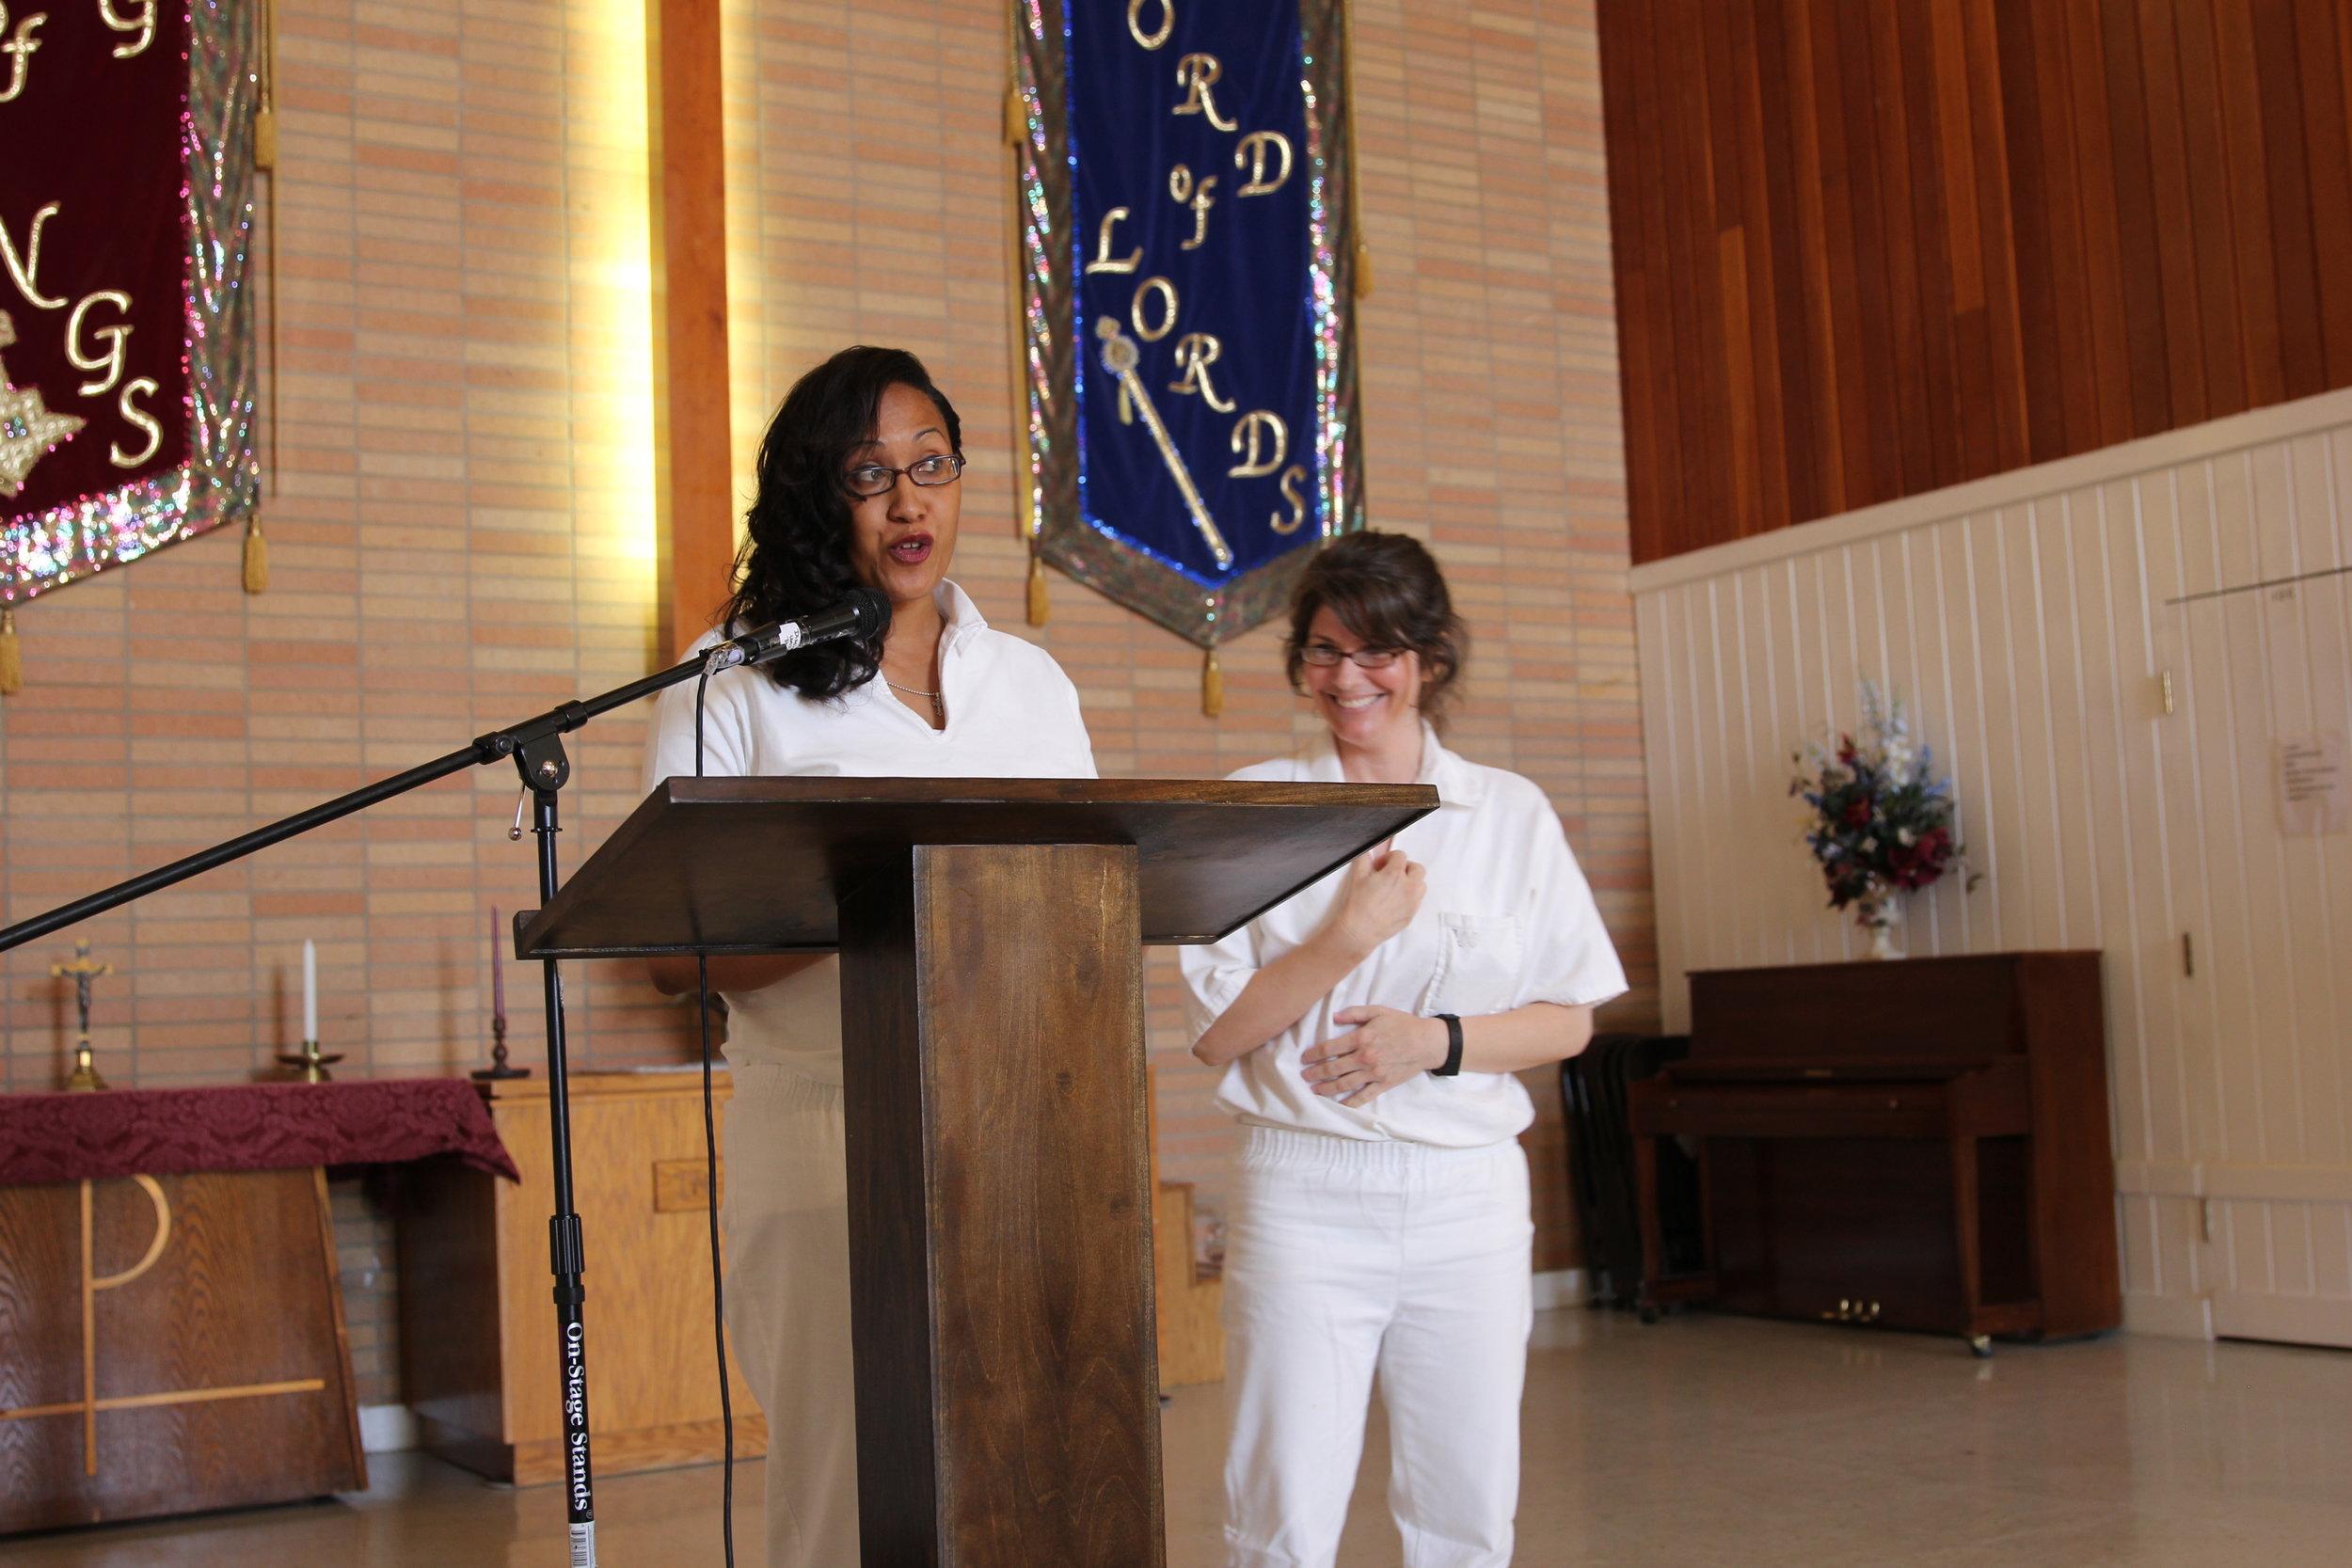 Arlene and Kim gave the graduation address